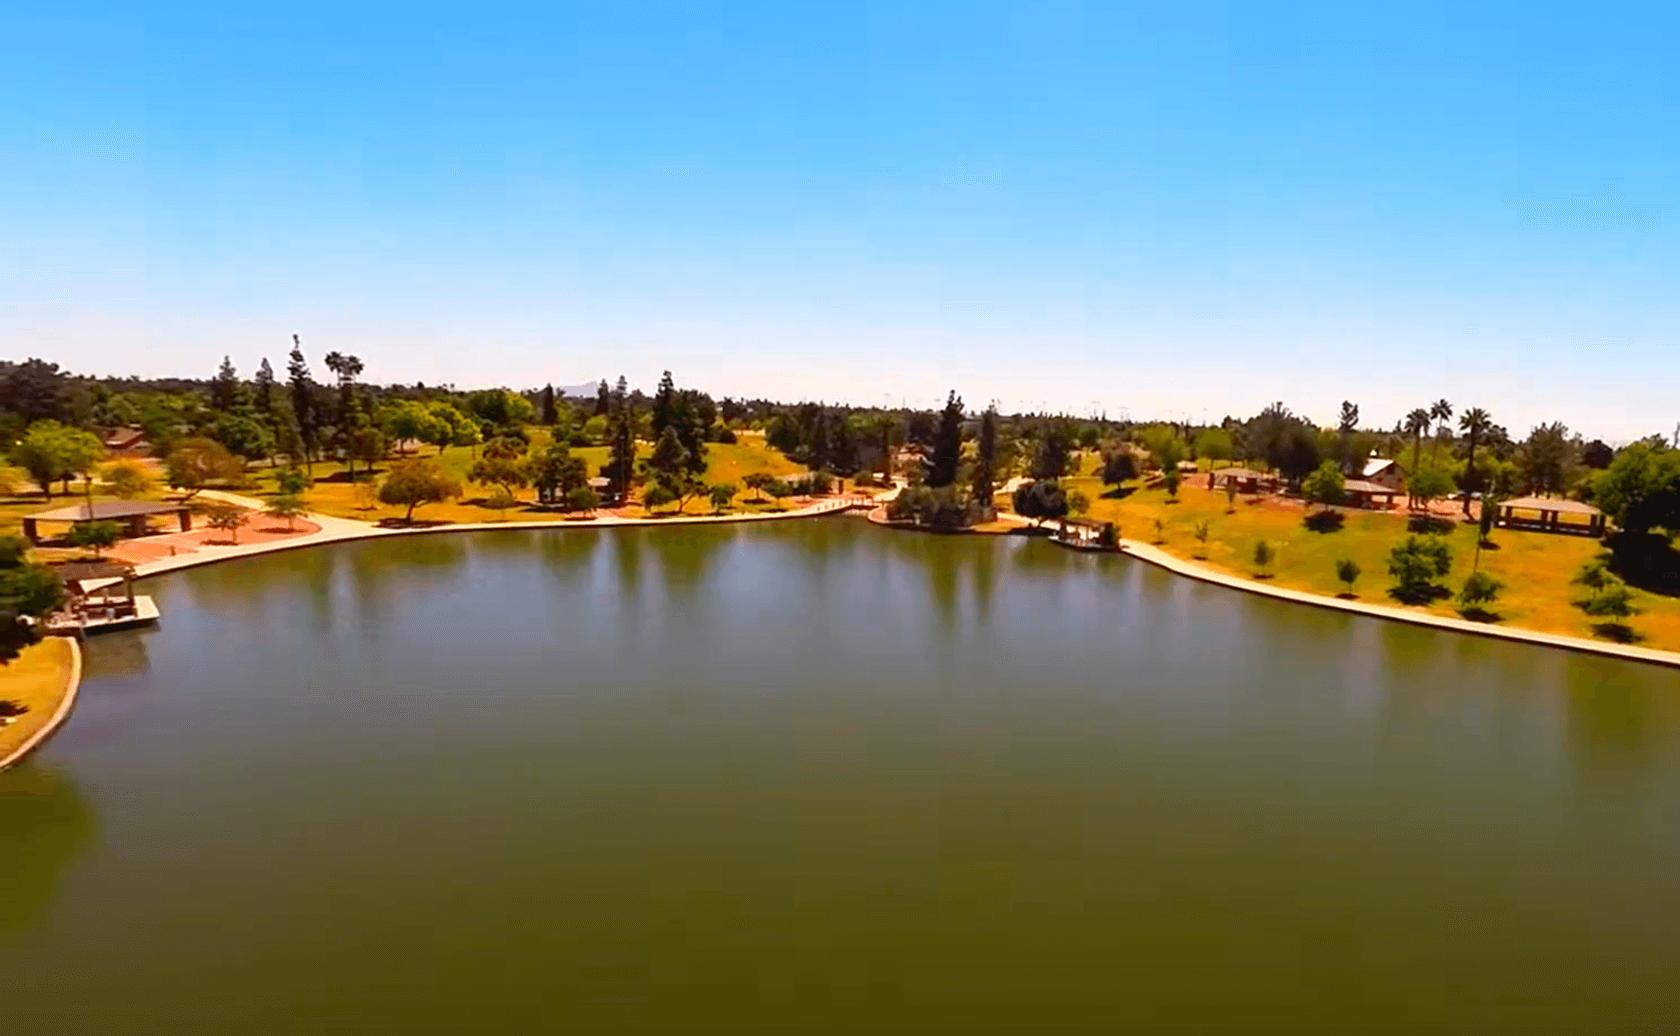 Kiwanis-Lake-Fishing-Guide-Tempe-AZ-02